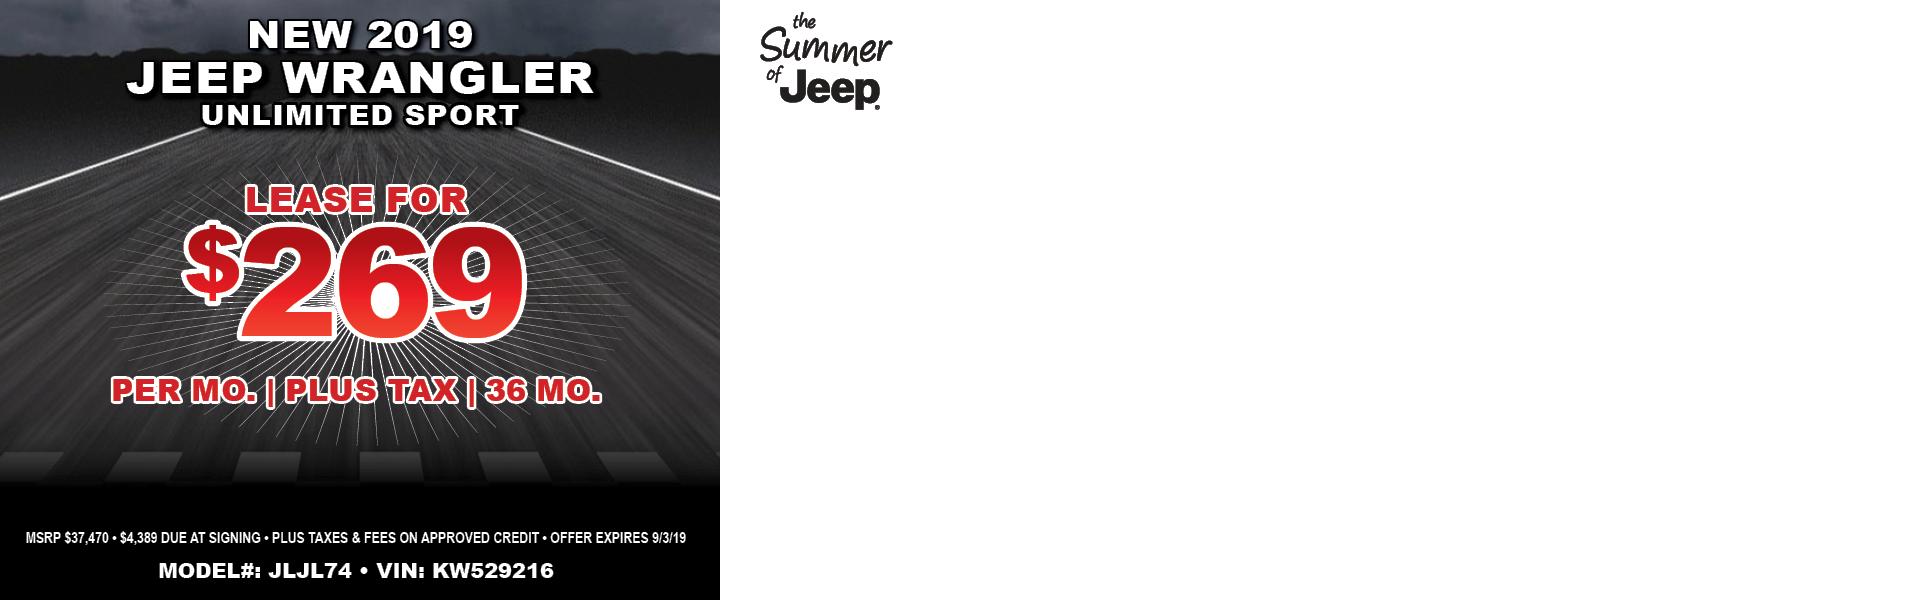 Jeep Wrangler Video